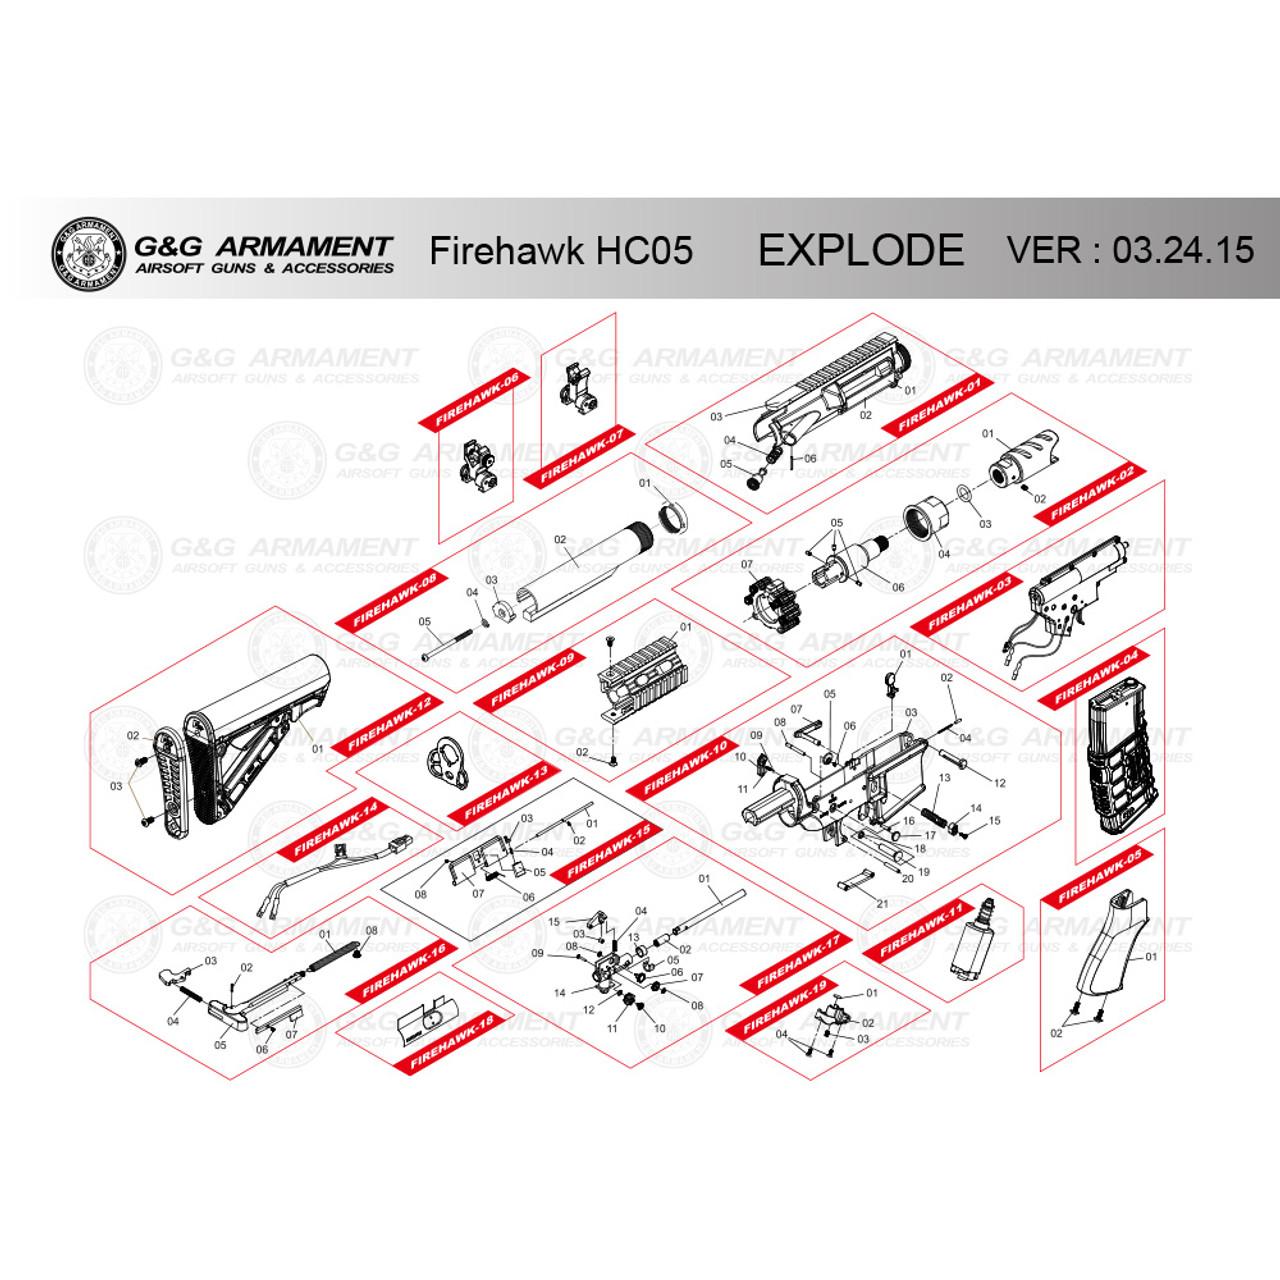 small resolution of firehawk wiring diagram wiring diagram library firehawk wiring diagram